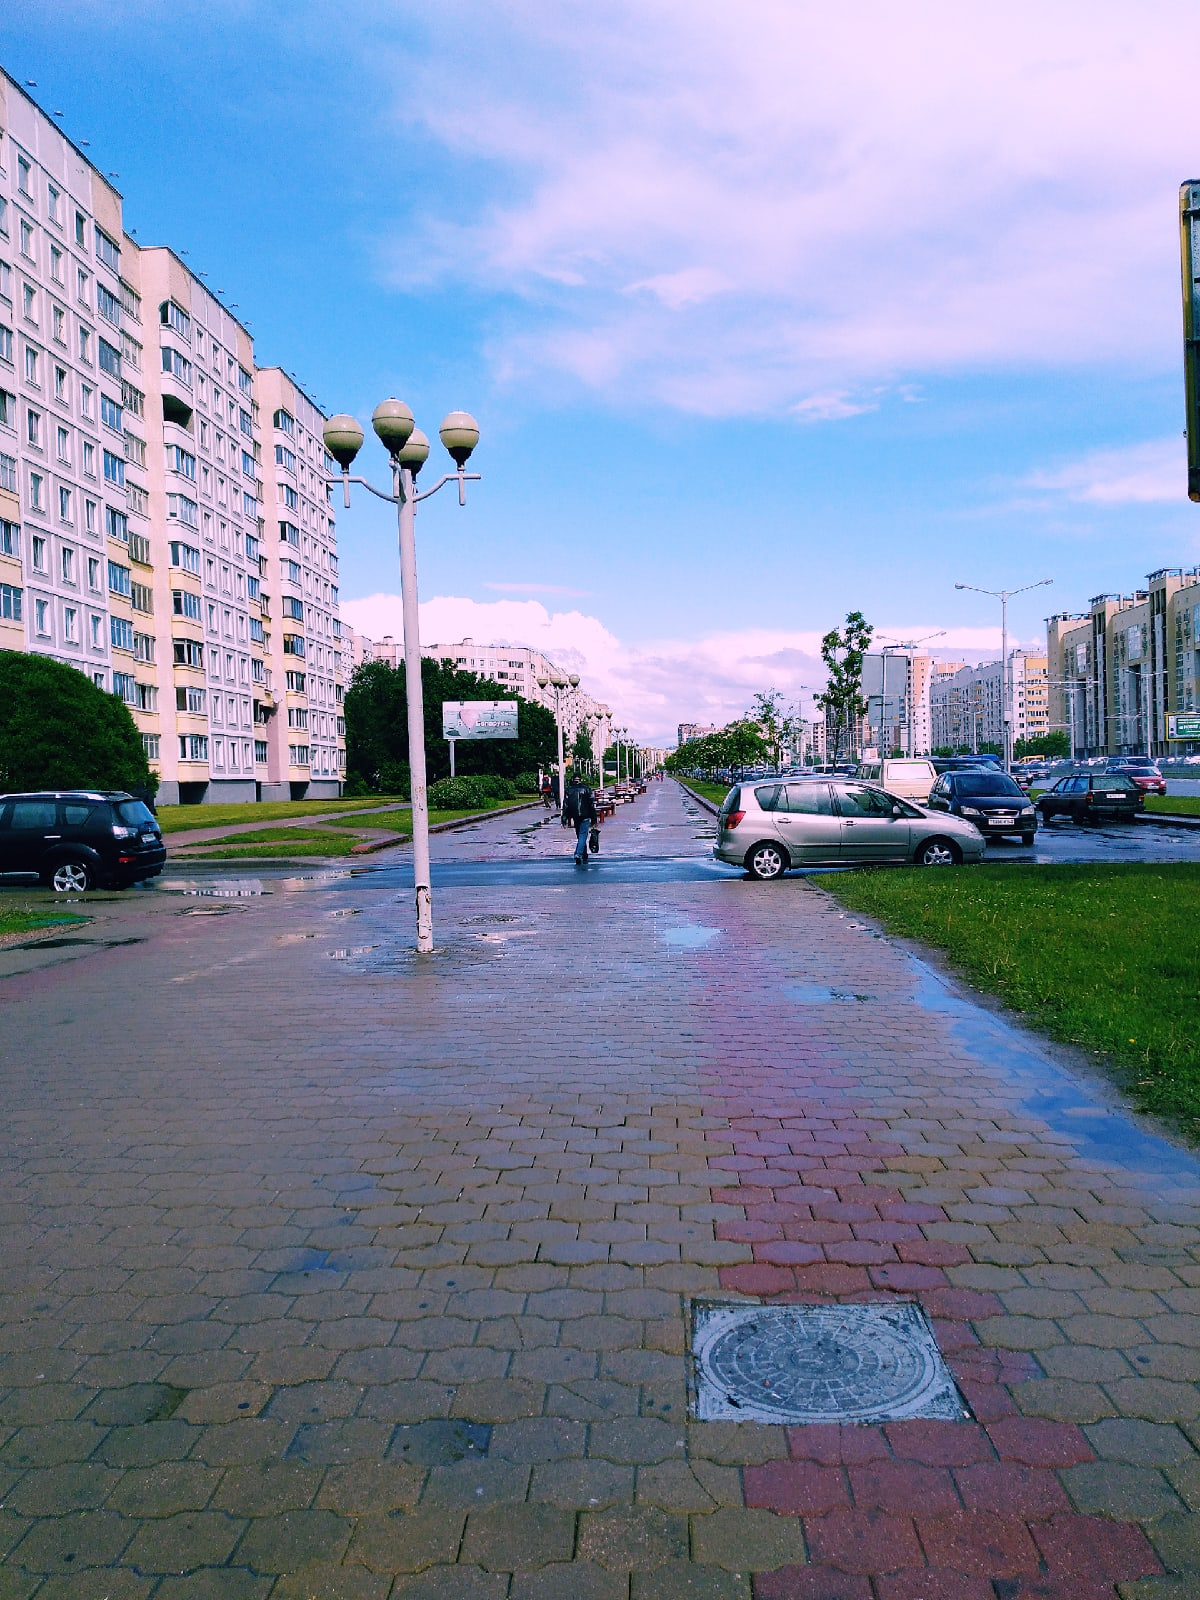 Минск во время пандемии. ФОТОРЕПОРТАЖ 14